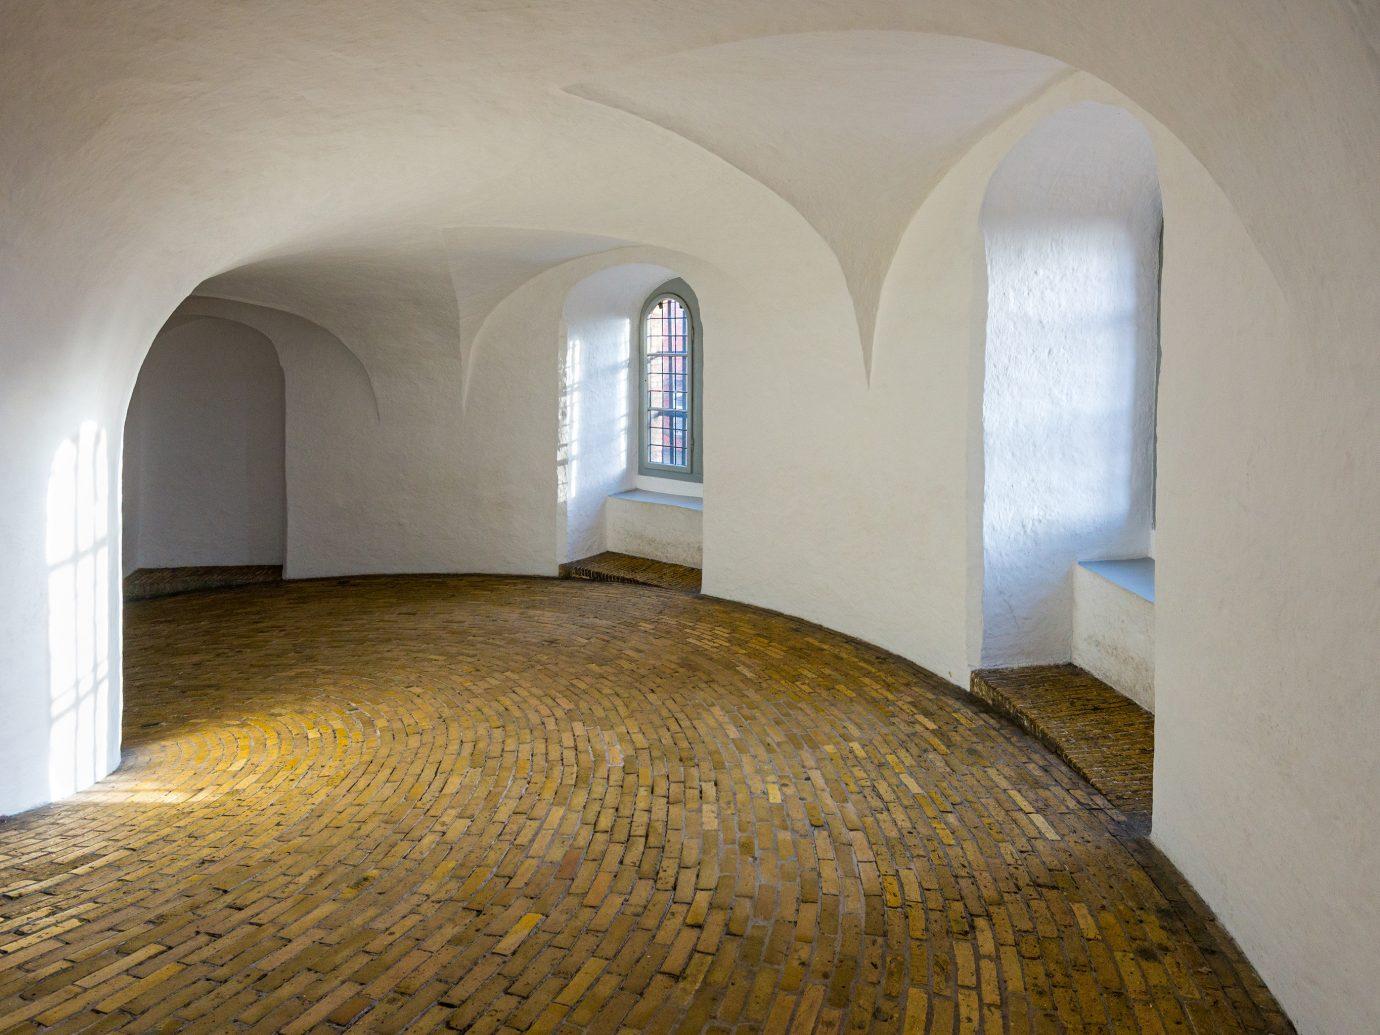 Copenhagen Denmark Trip Ideas indoor wall building property Architecture arch estate daylighting ceiling floor apartment house window Bedroom stone